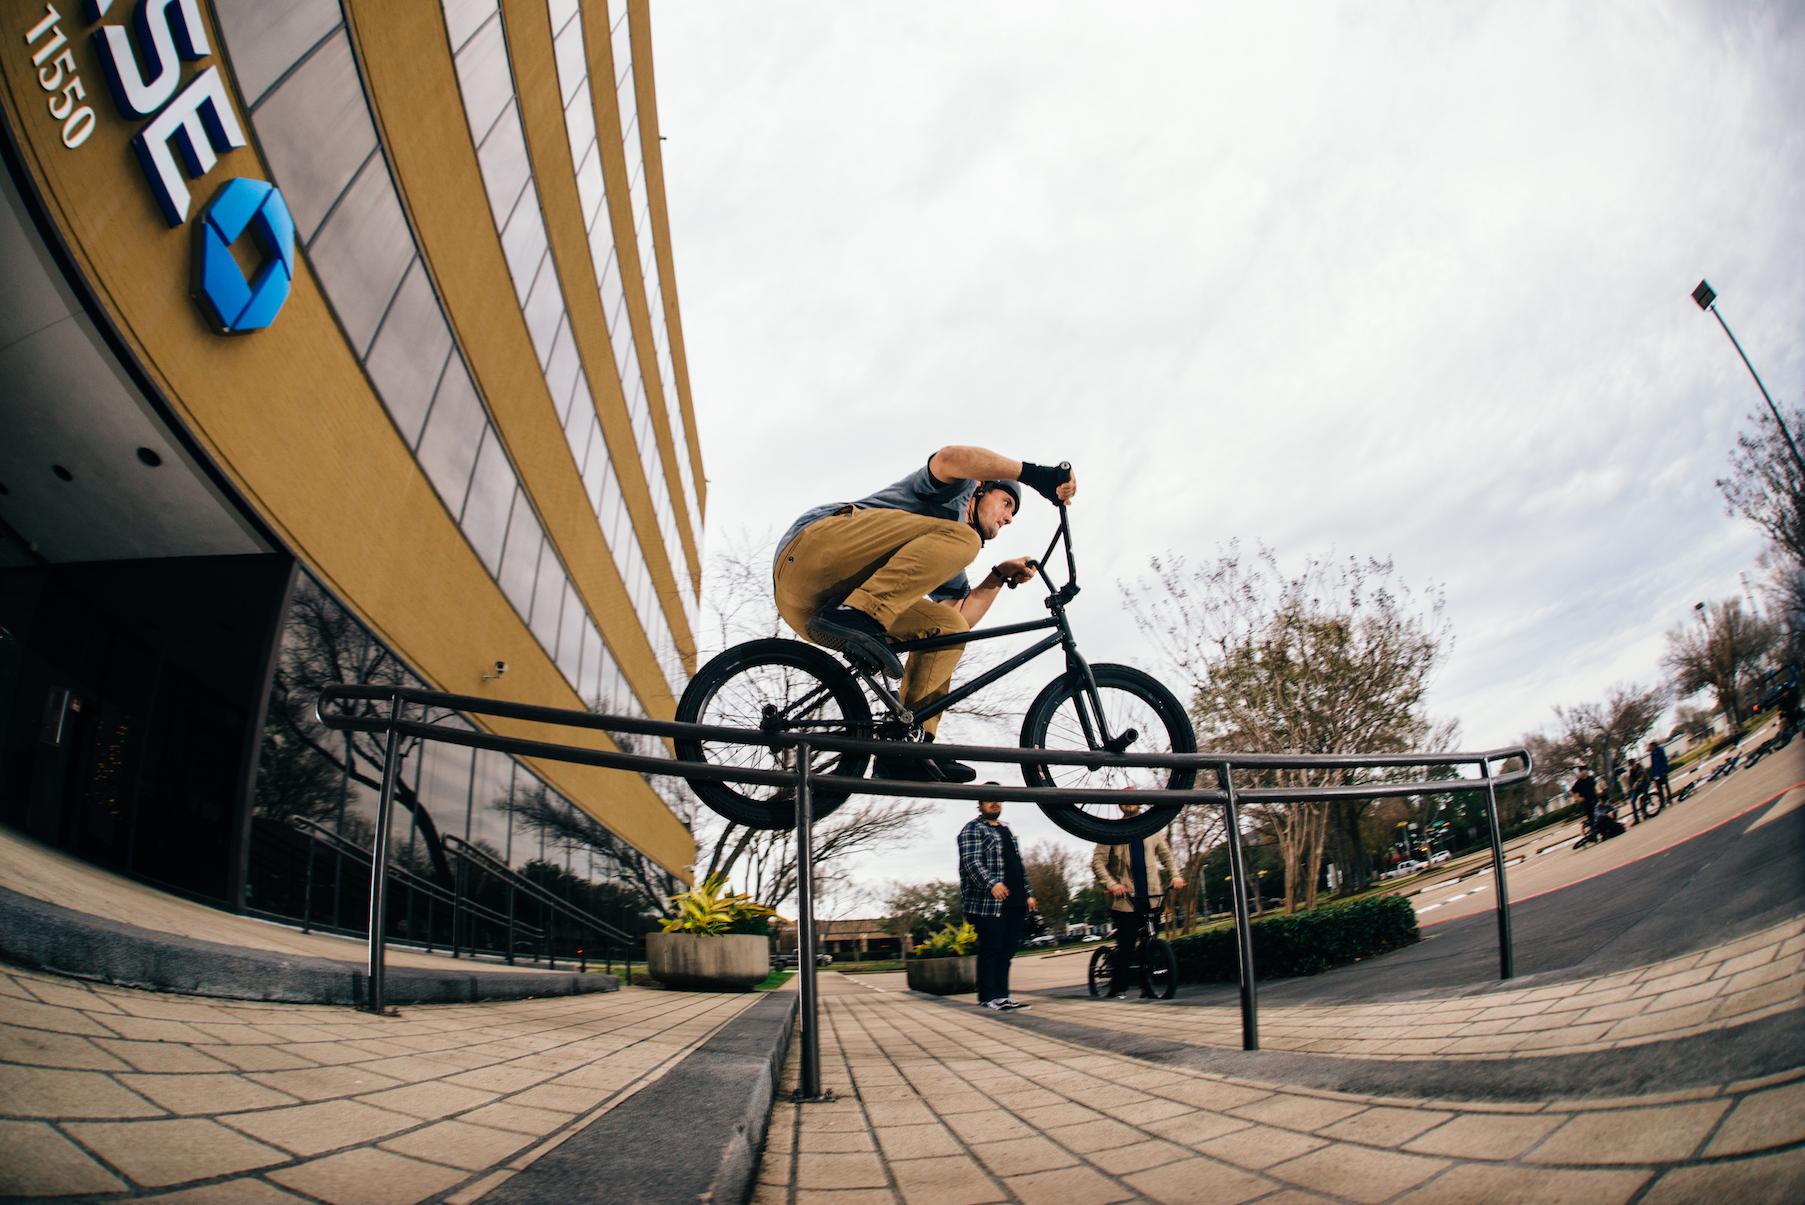 180107 sunday street rides_KirbyCrumpler_HALF_10.jpg